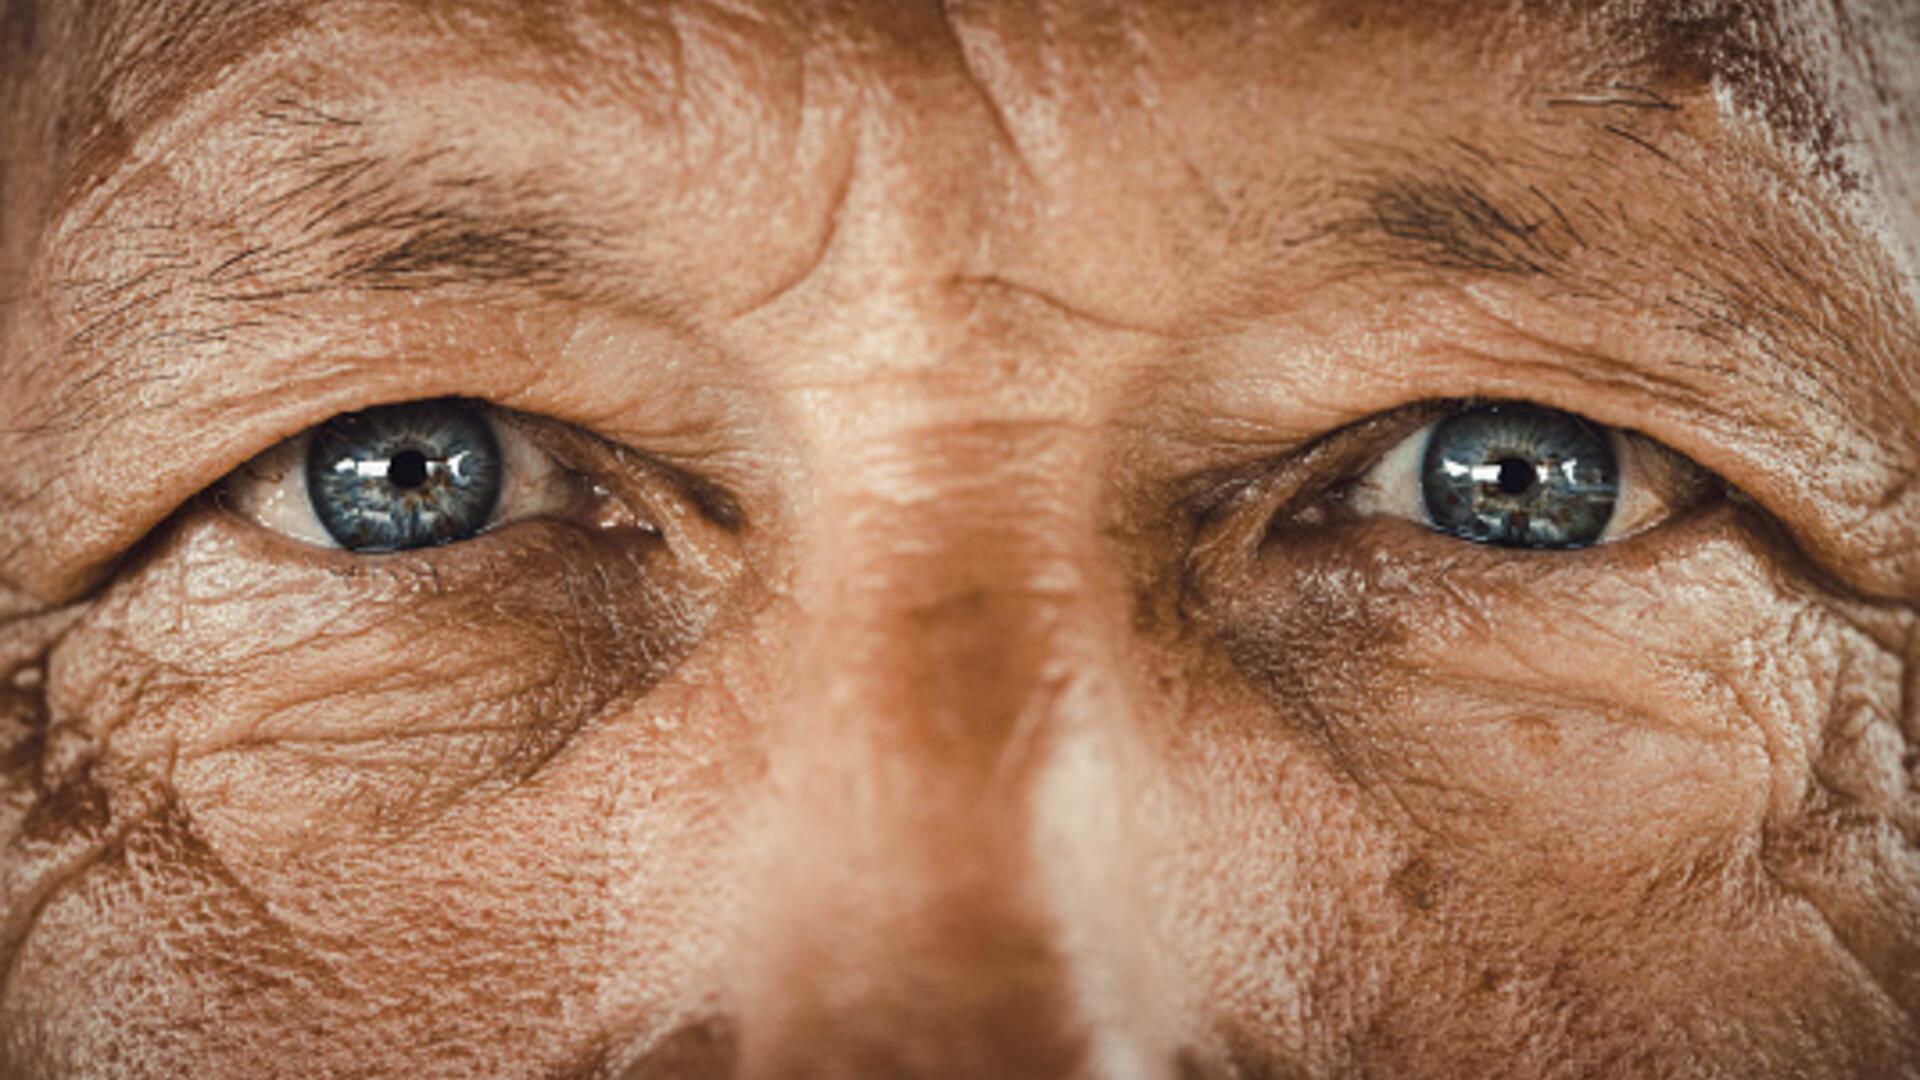 Stock image of a elderly man's eyes